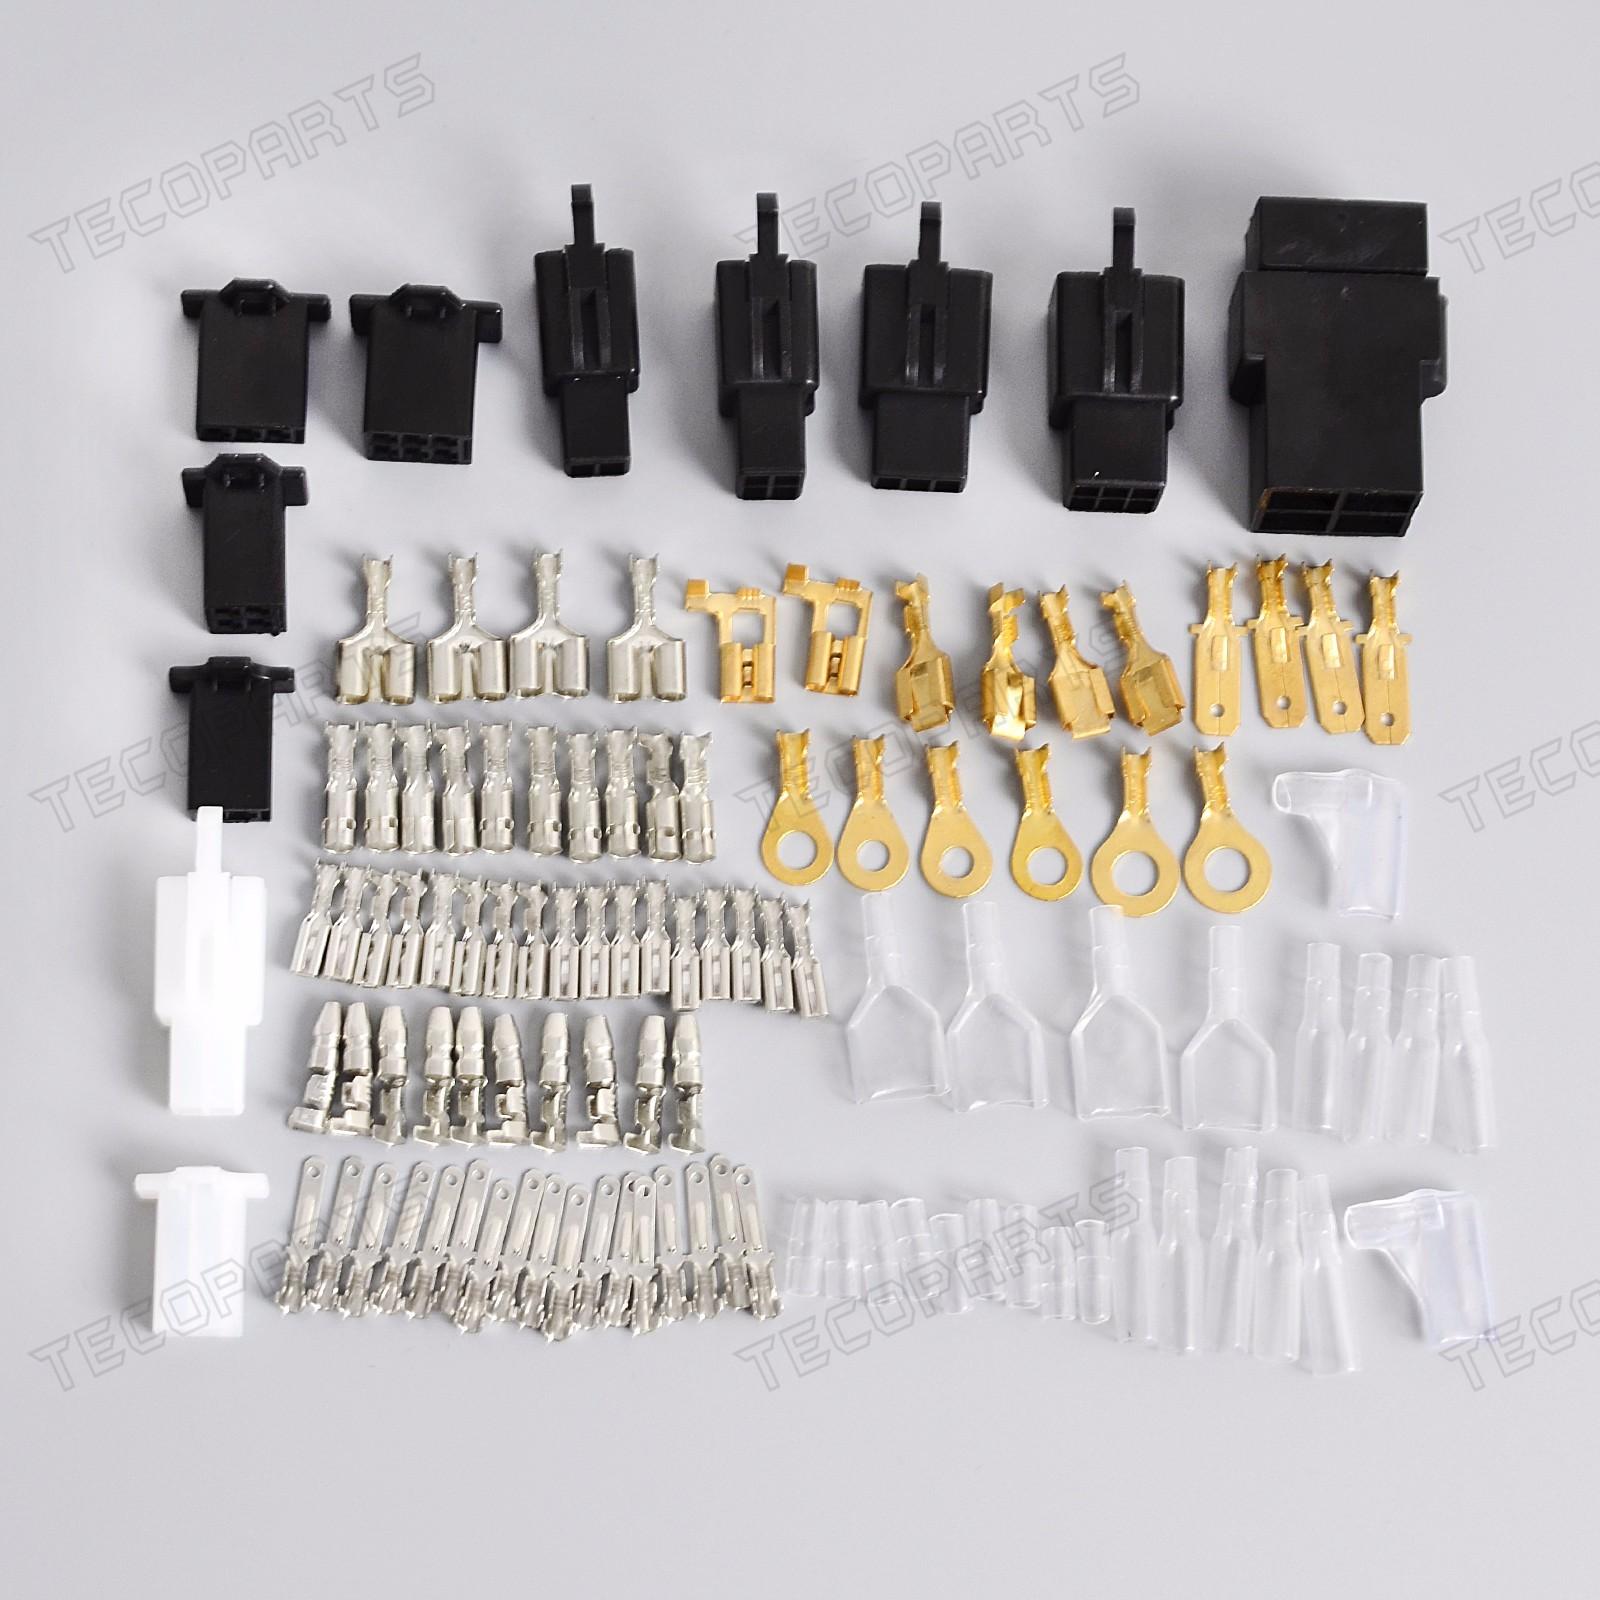 hight resolution of wiring loom repair for honda cb550 cb750 gl500 gl650 silverwing gl1000 gl1100